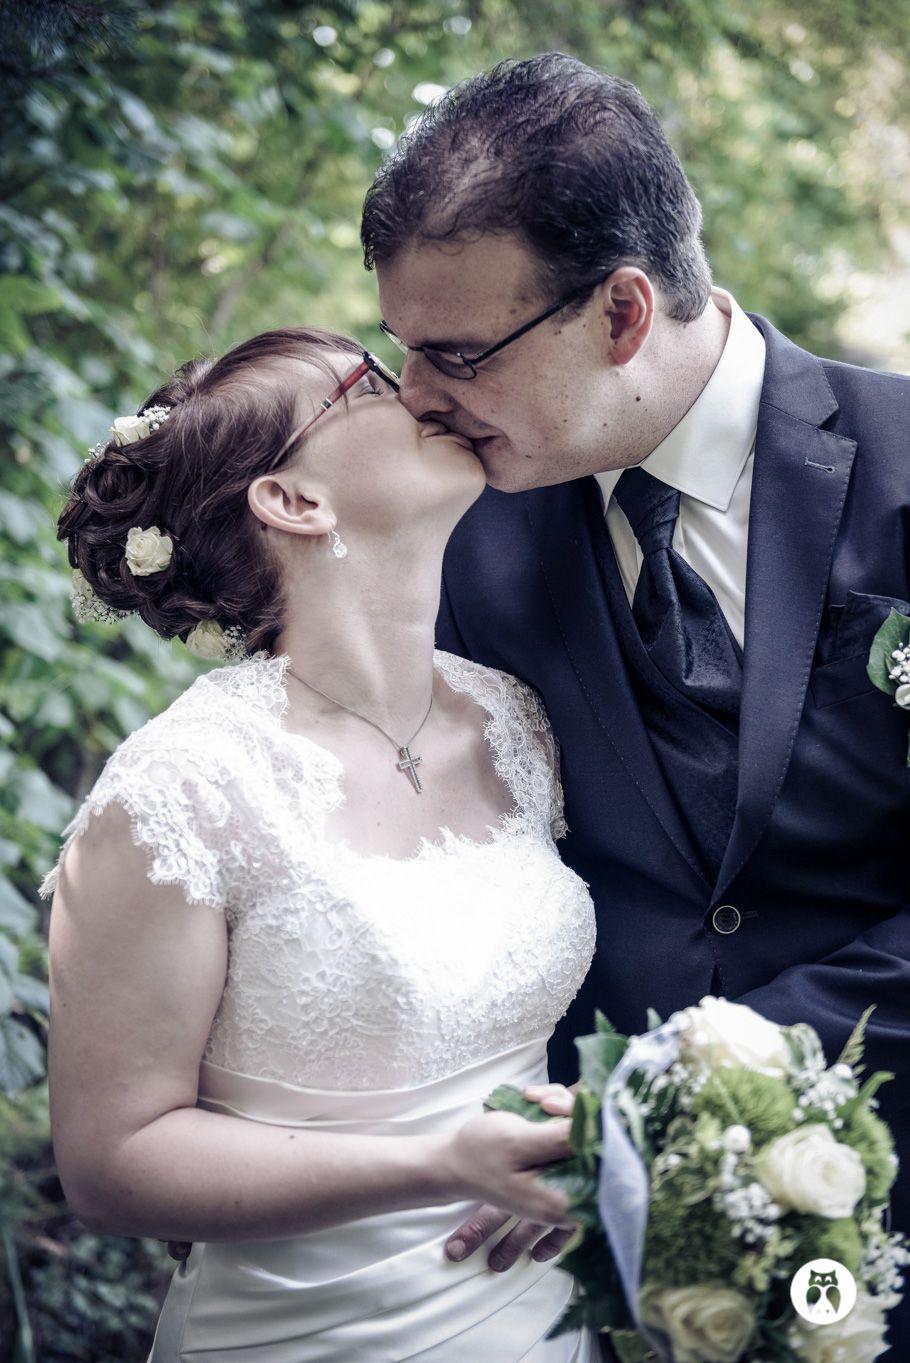 Hochzeitsfotograf allgäu brautpaarshooting christian u andrea